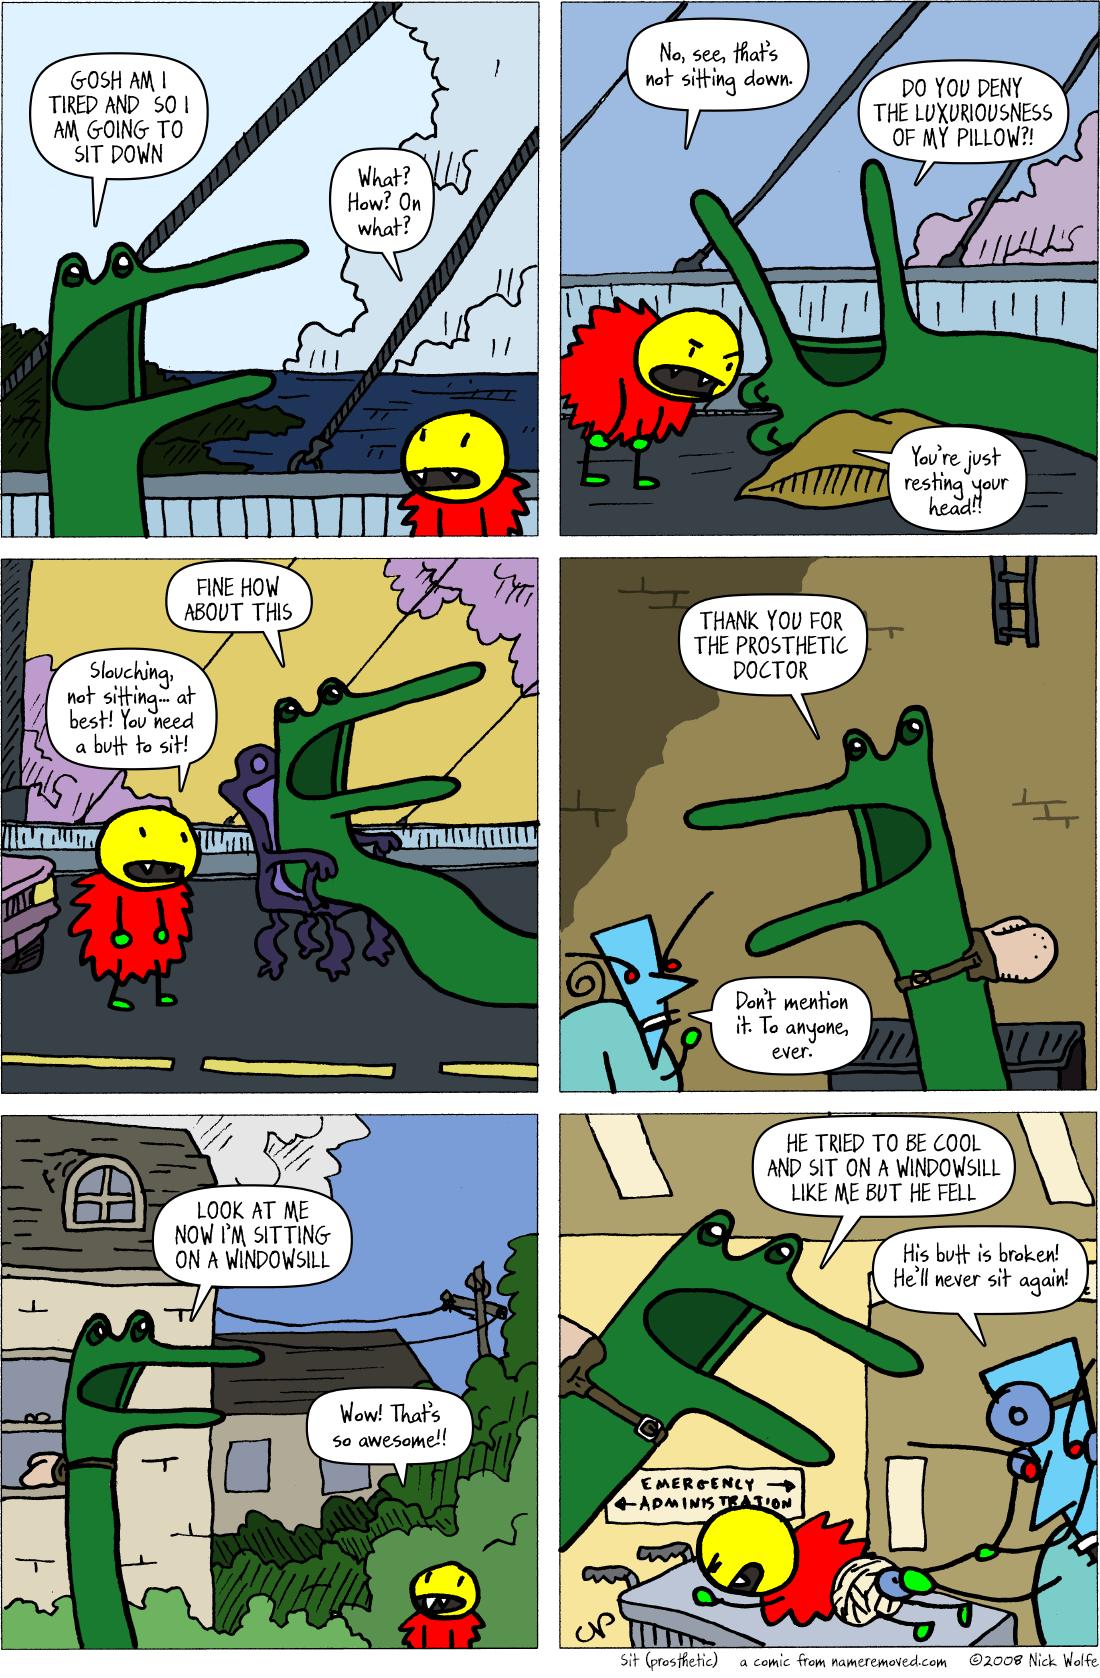 Sit (prosthetic)